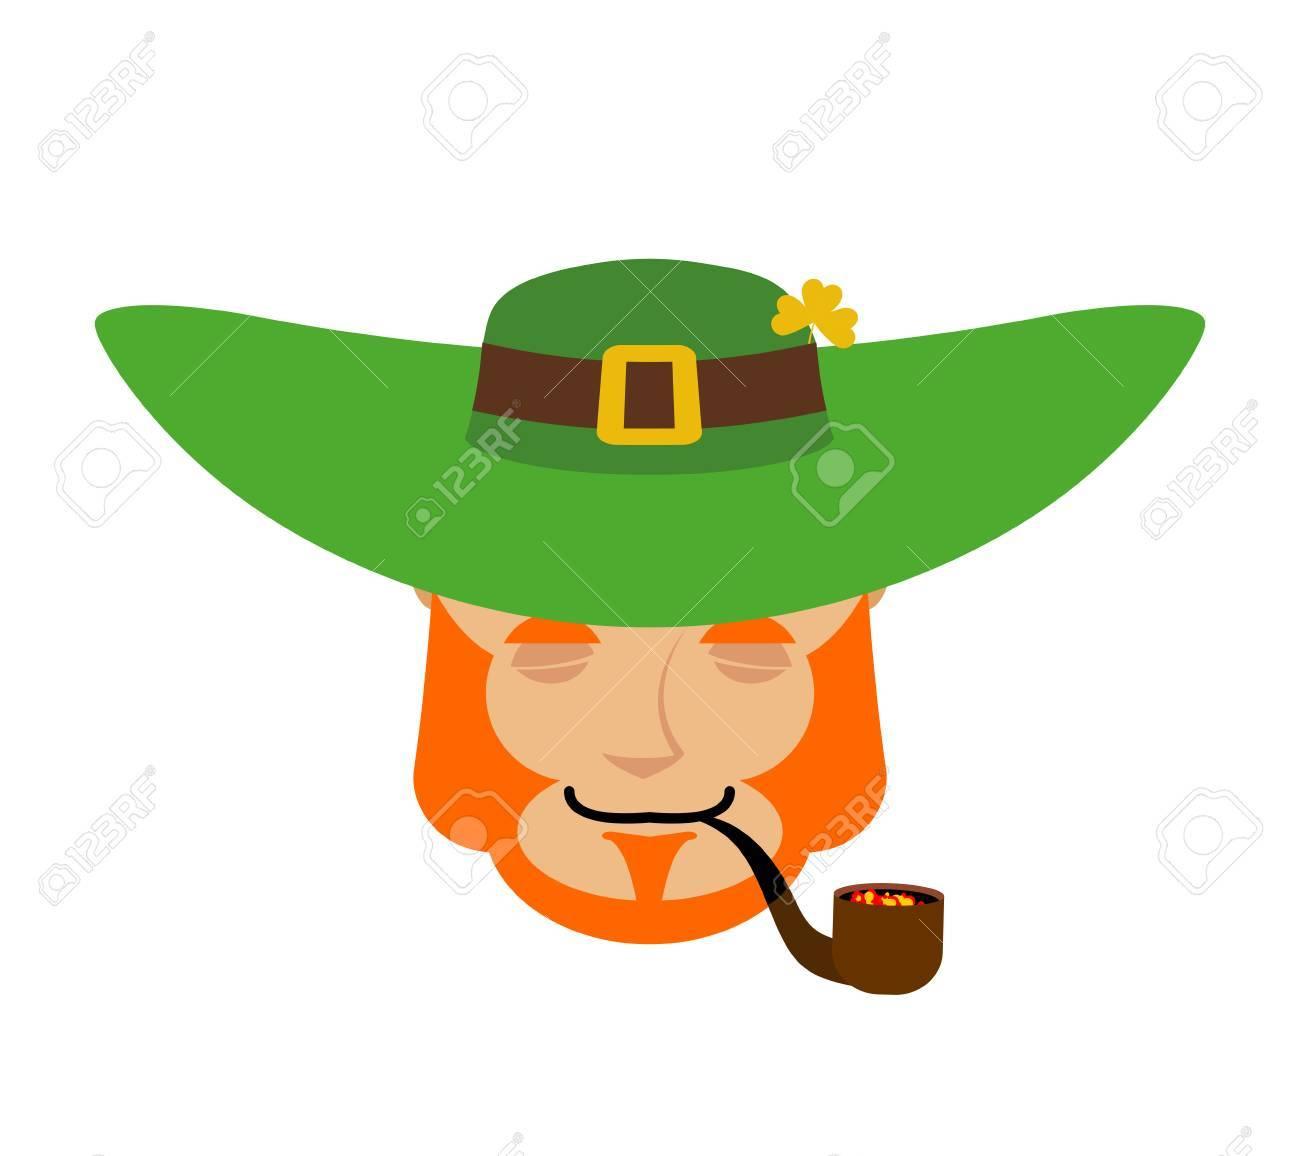 bfdf840764e0b Dwarf with red beard asleep Emoji. Irish elf emotions. Stock Vector